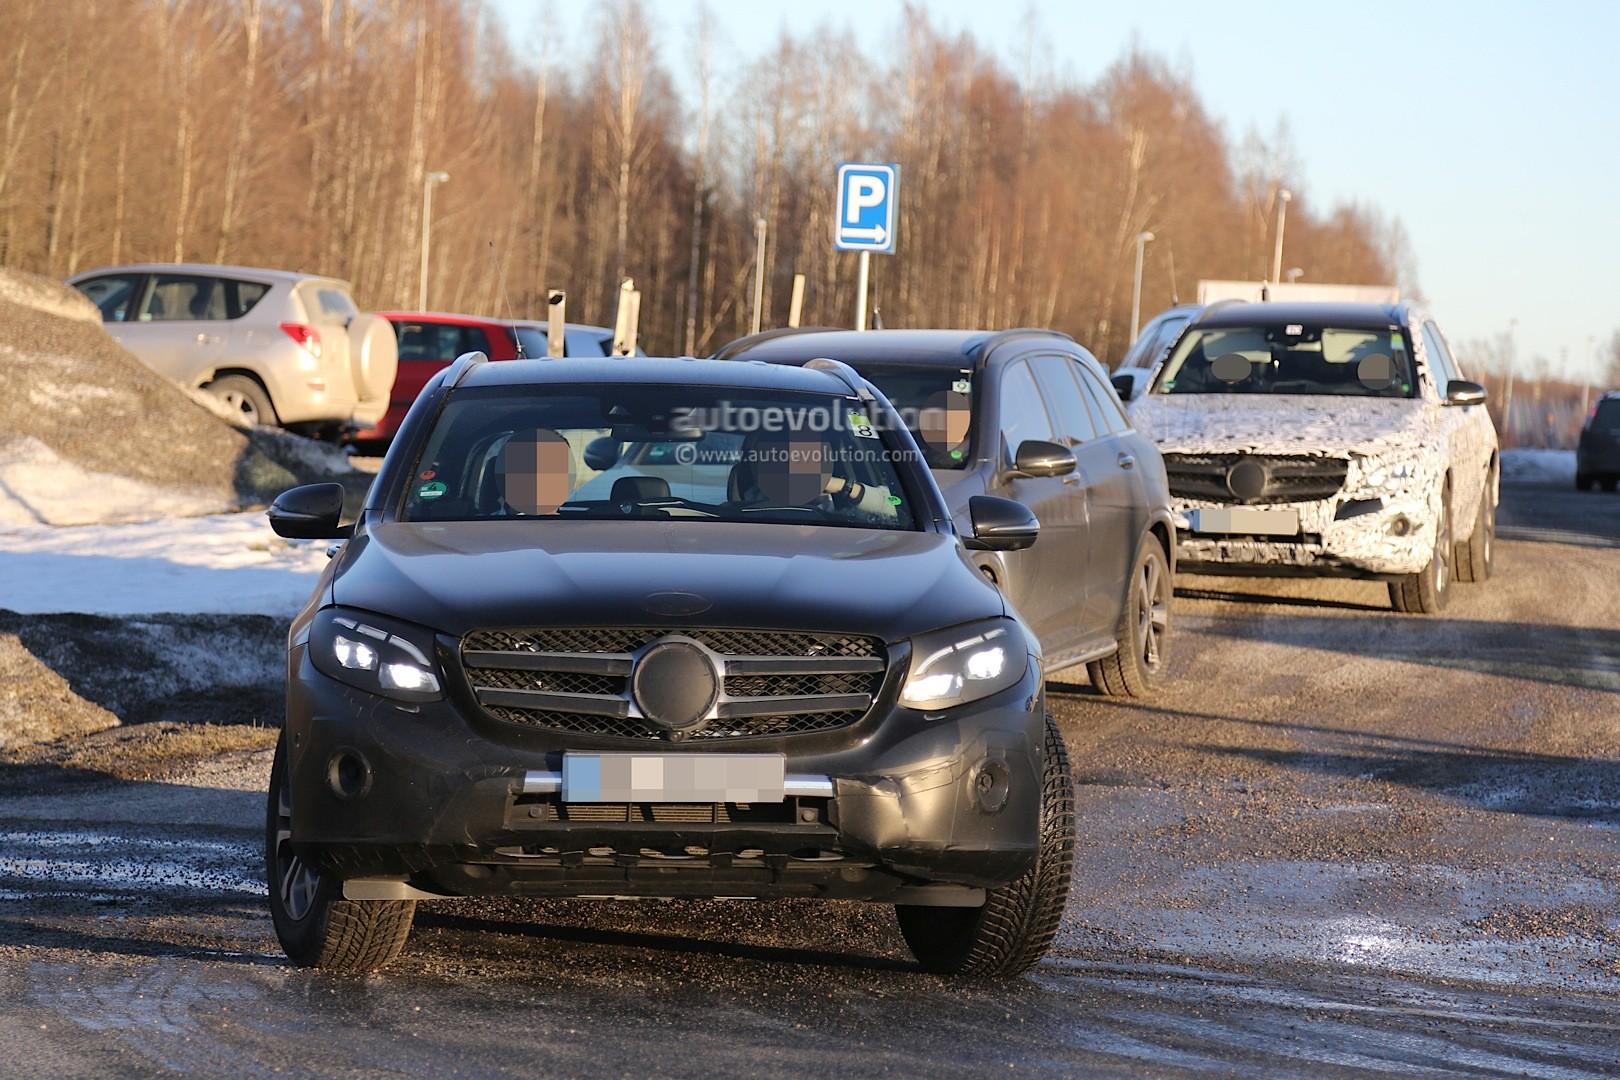 2015 - [Mercedes] GLC (GLK II) [X205] - Page 10 2016-mercedes-glc-spy-photos-show-nearly-undisguised-pre-production-prototypes_21